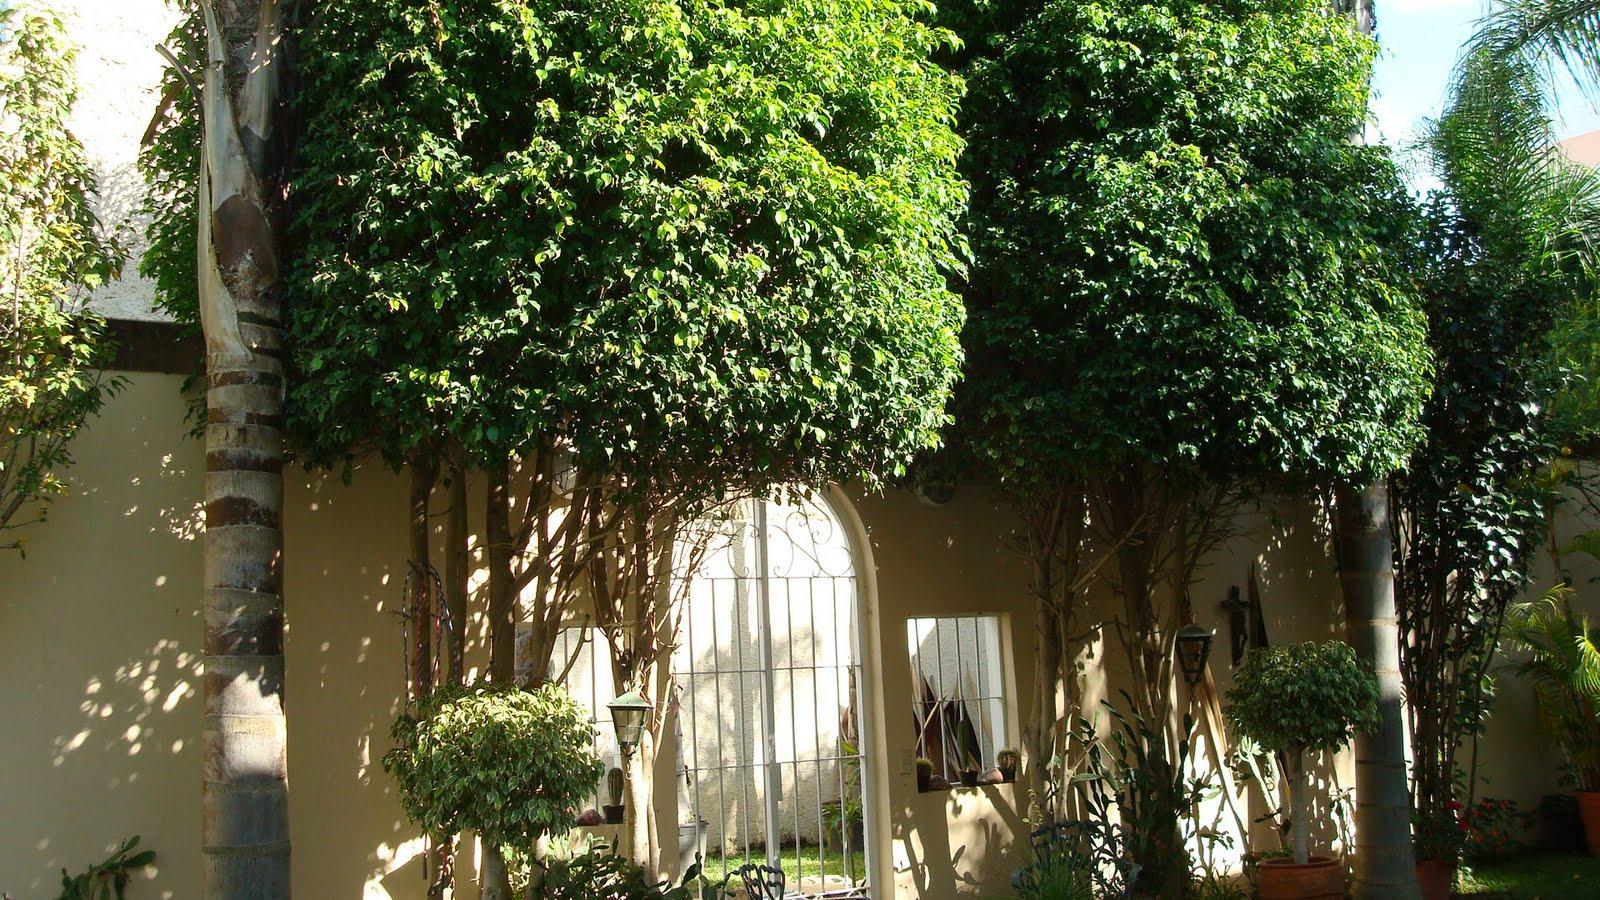 Sancarlosfortin sancarlosfortin ficus en el jardin for Jardin ficus quilpue